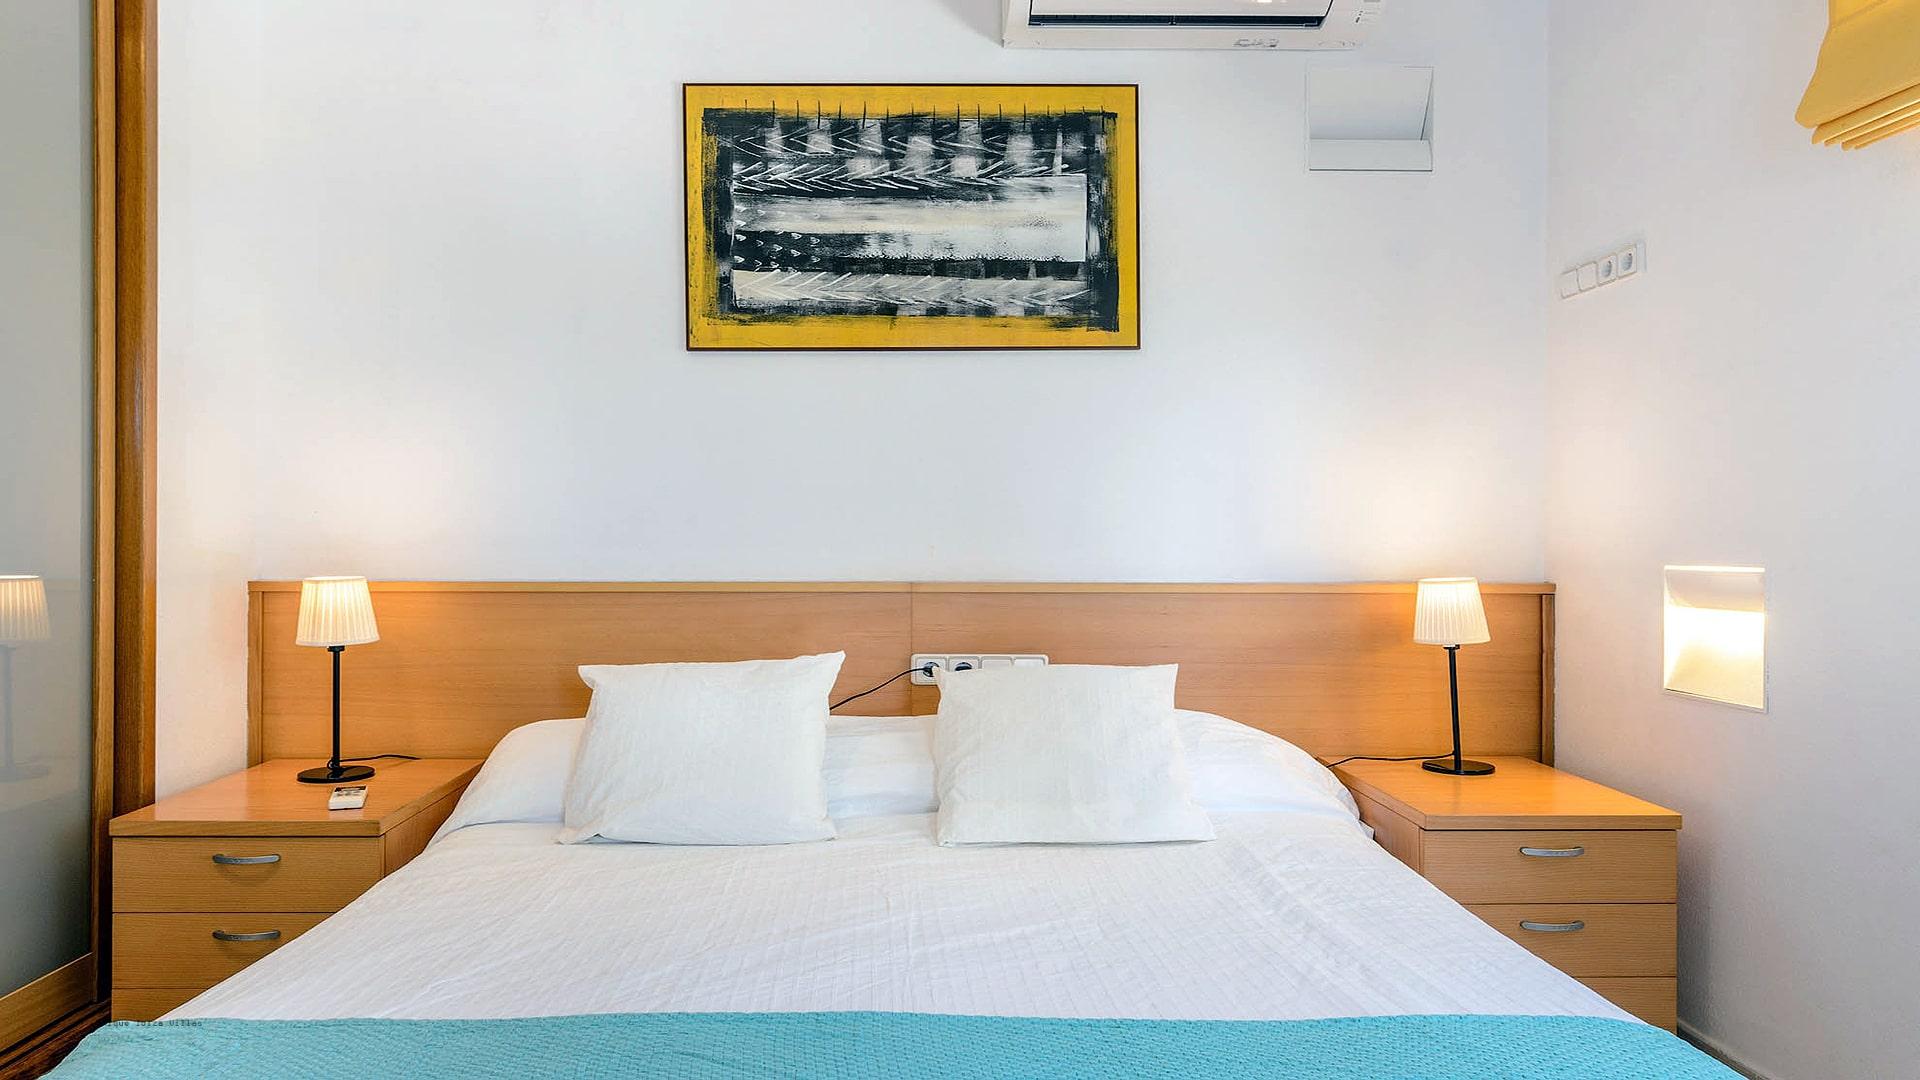 Villa Can Fluxa Ibiza 48 Bedroom 4